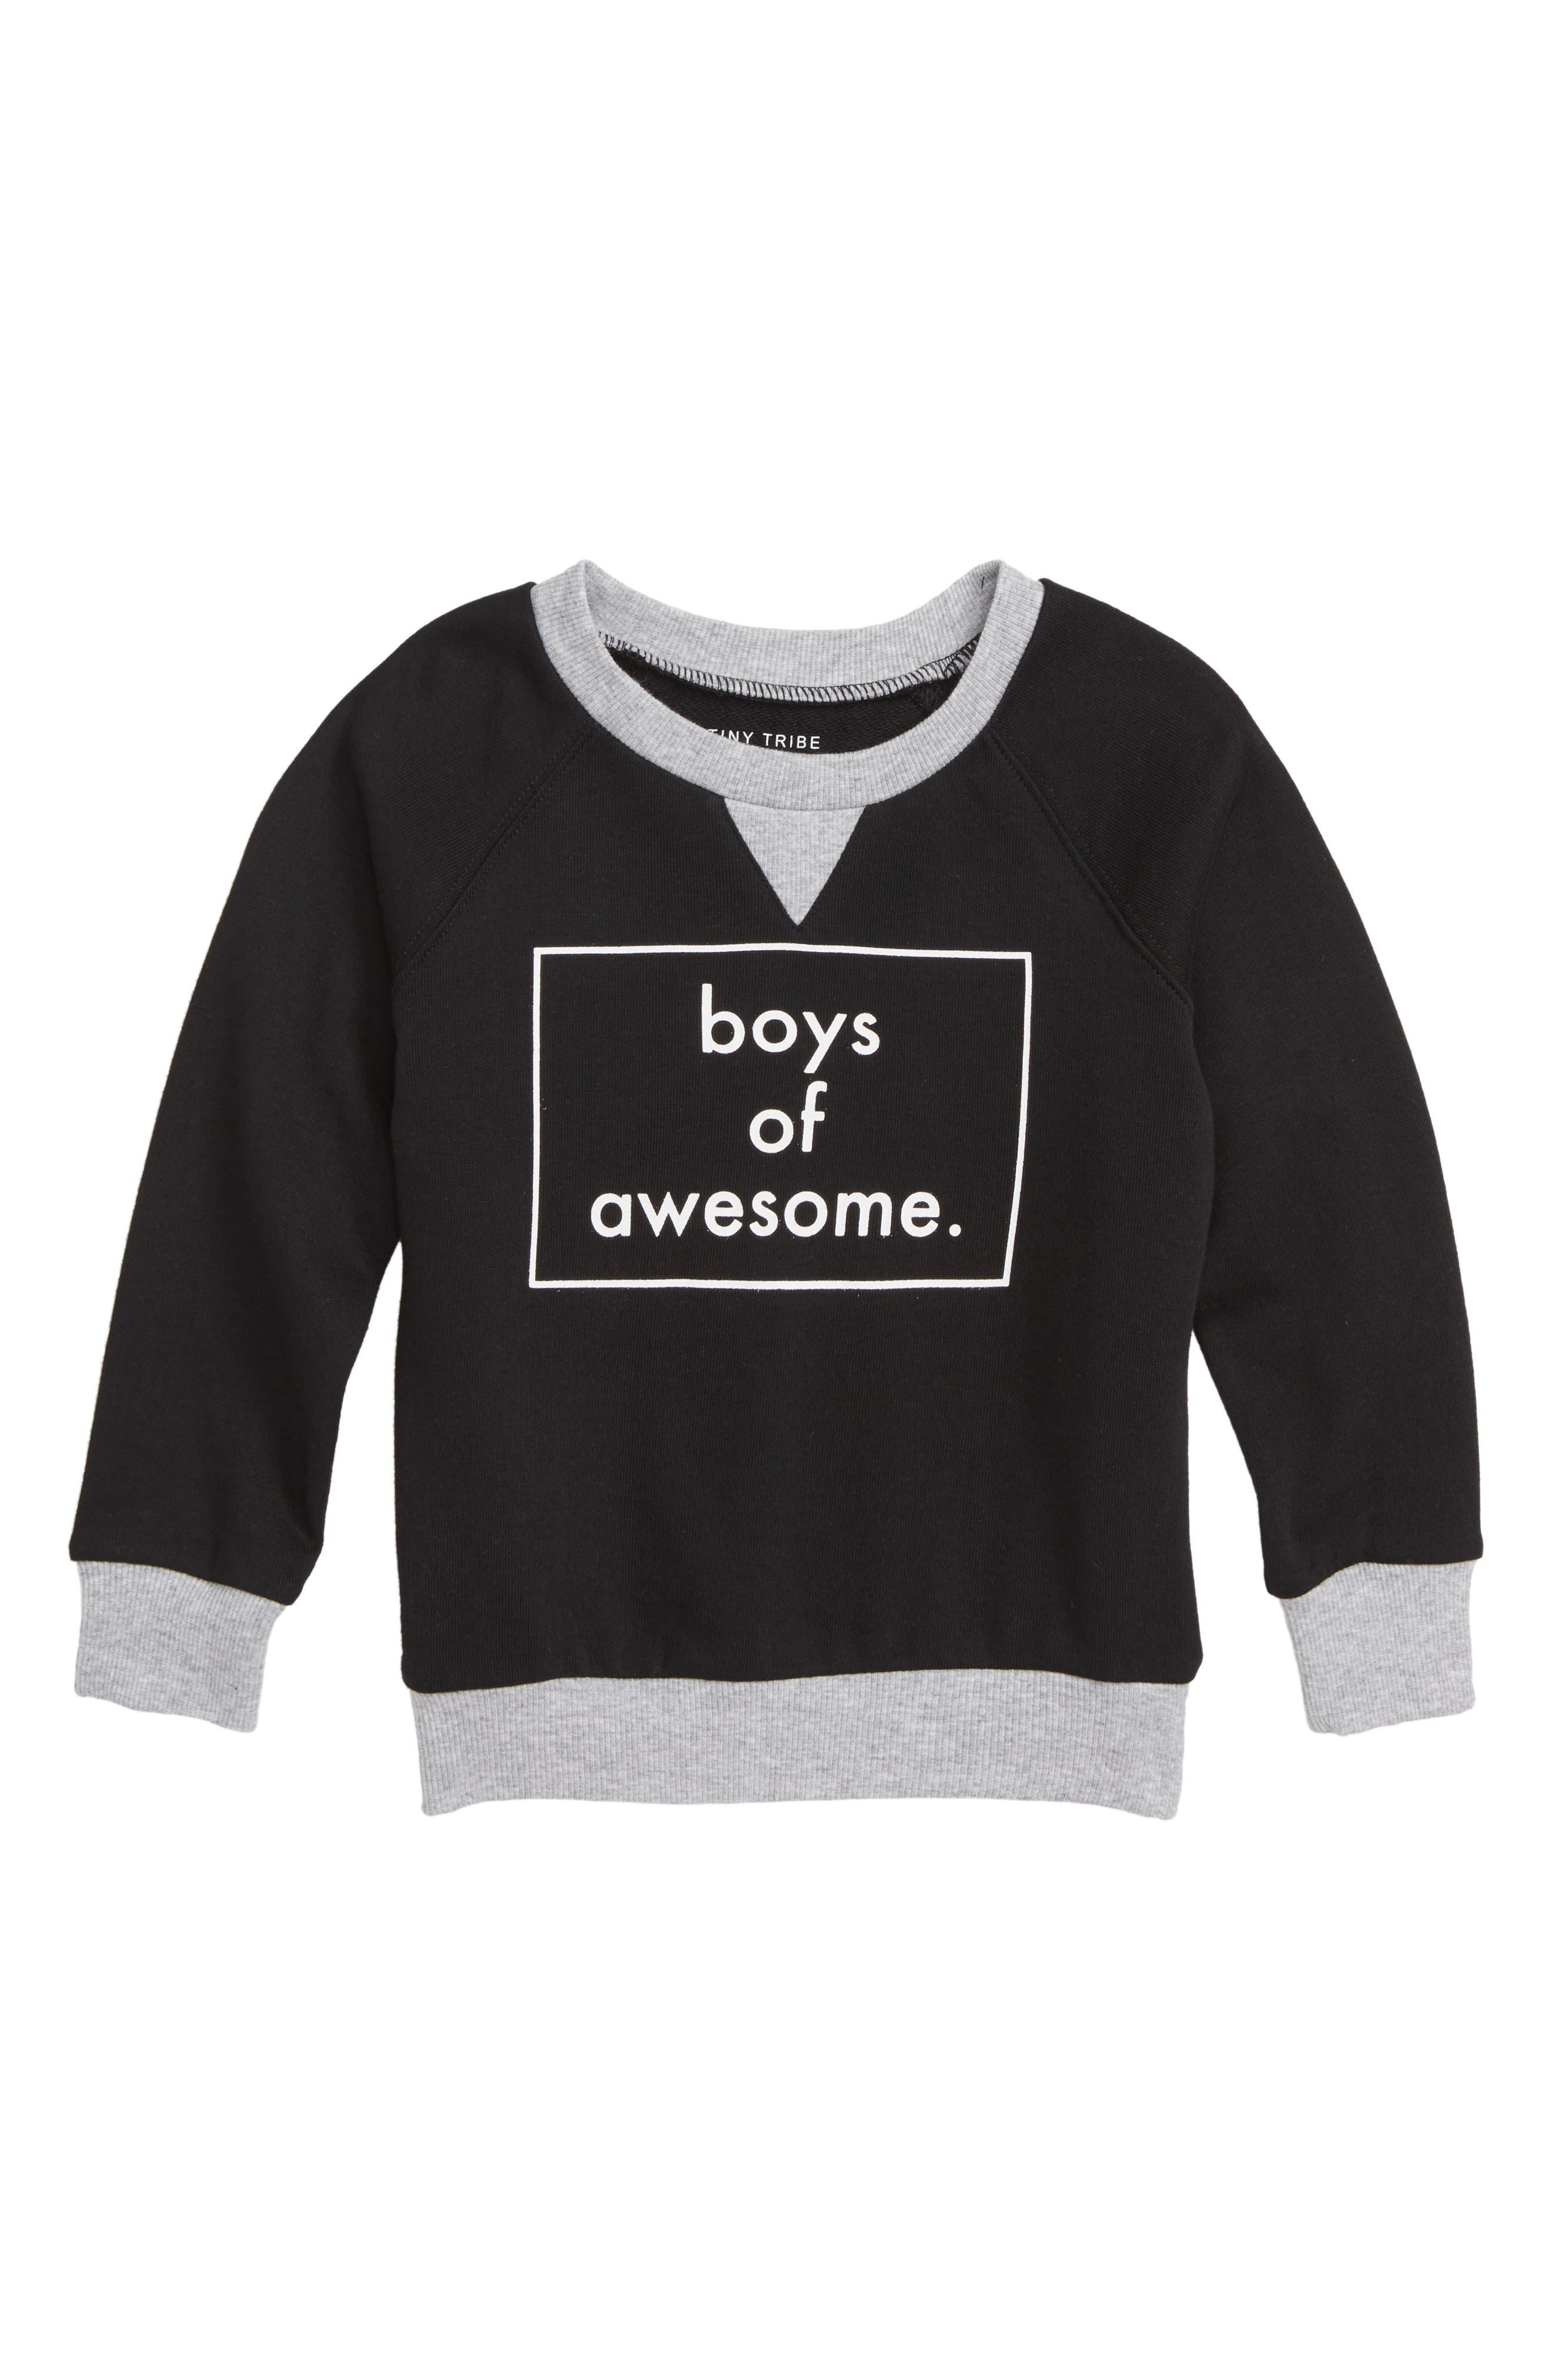 Boys of Awesome Sweatshirt,                         Main,                         color, 001